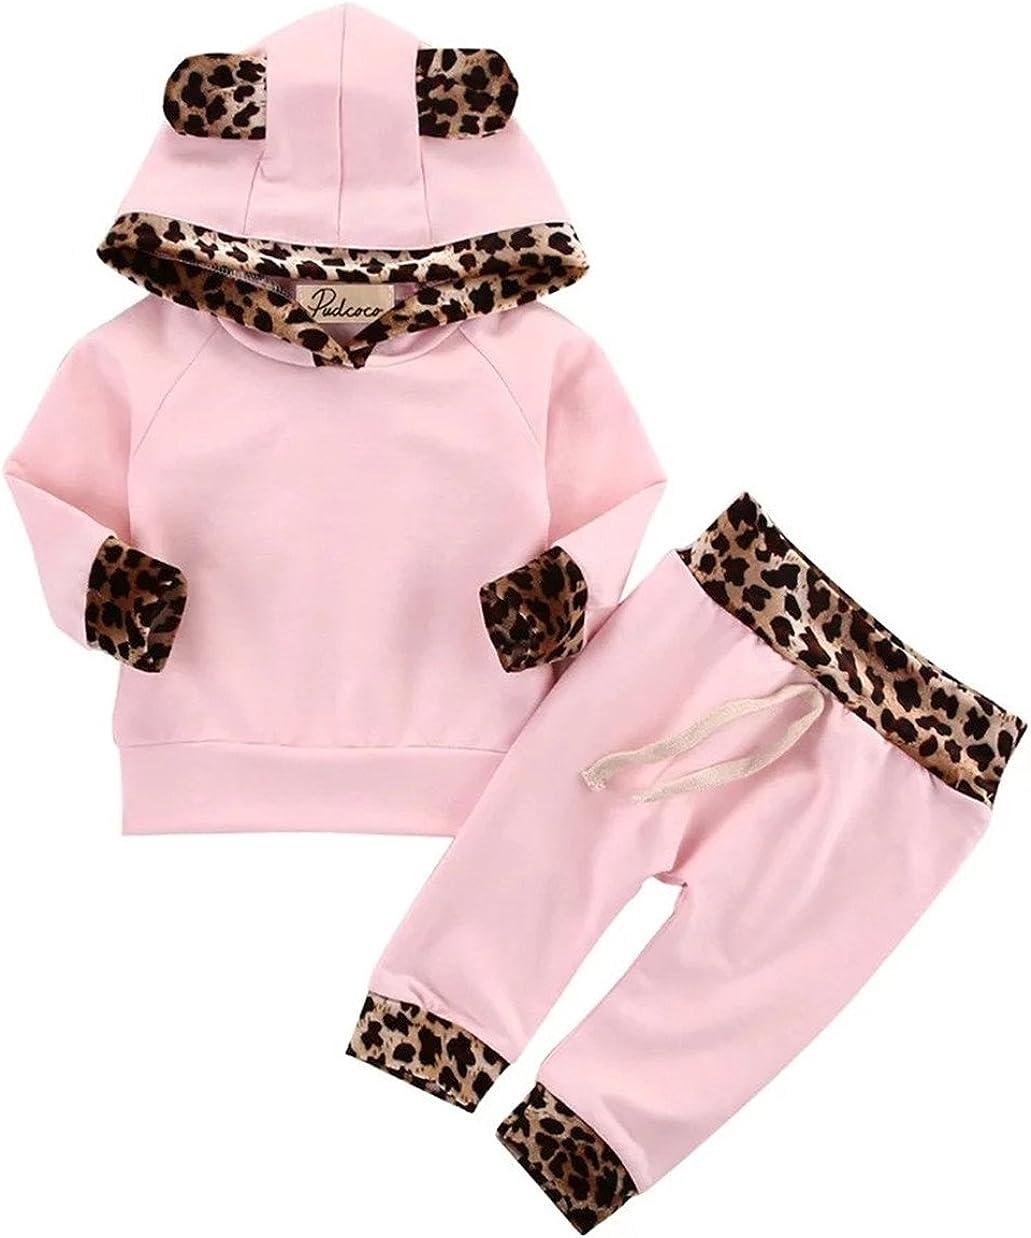 Kfnire T-Shirt Top + Pantaloni Completi per Bambina con Felpa Rosa Leopardata...